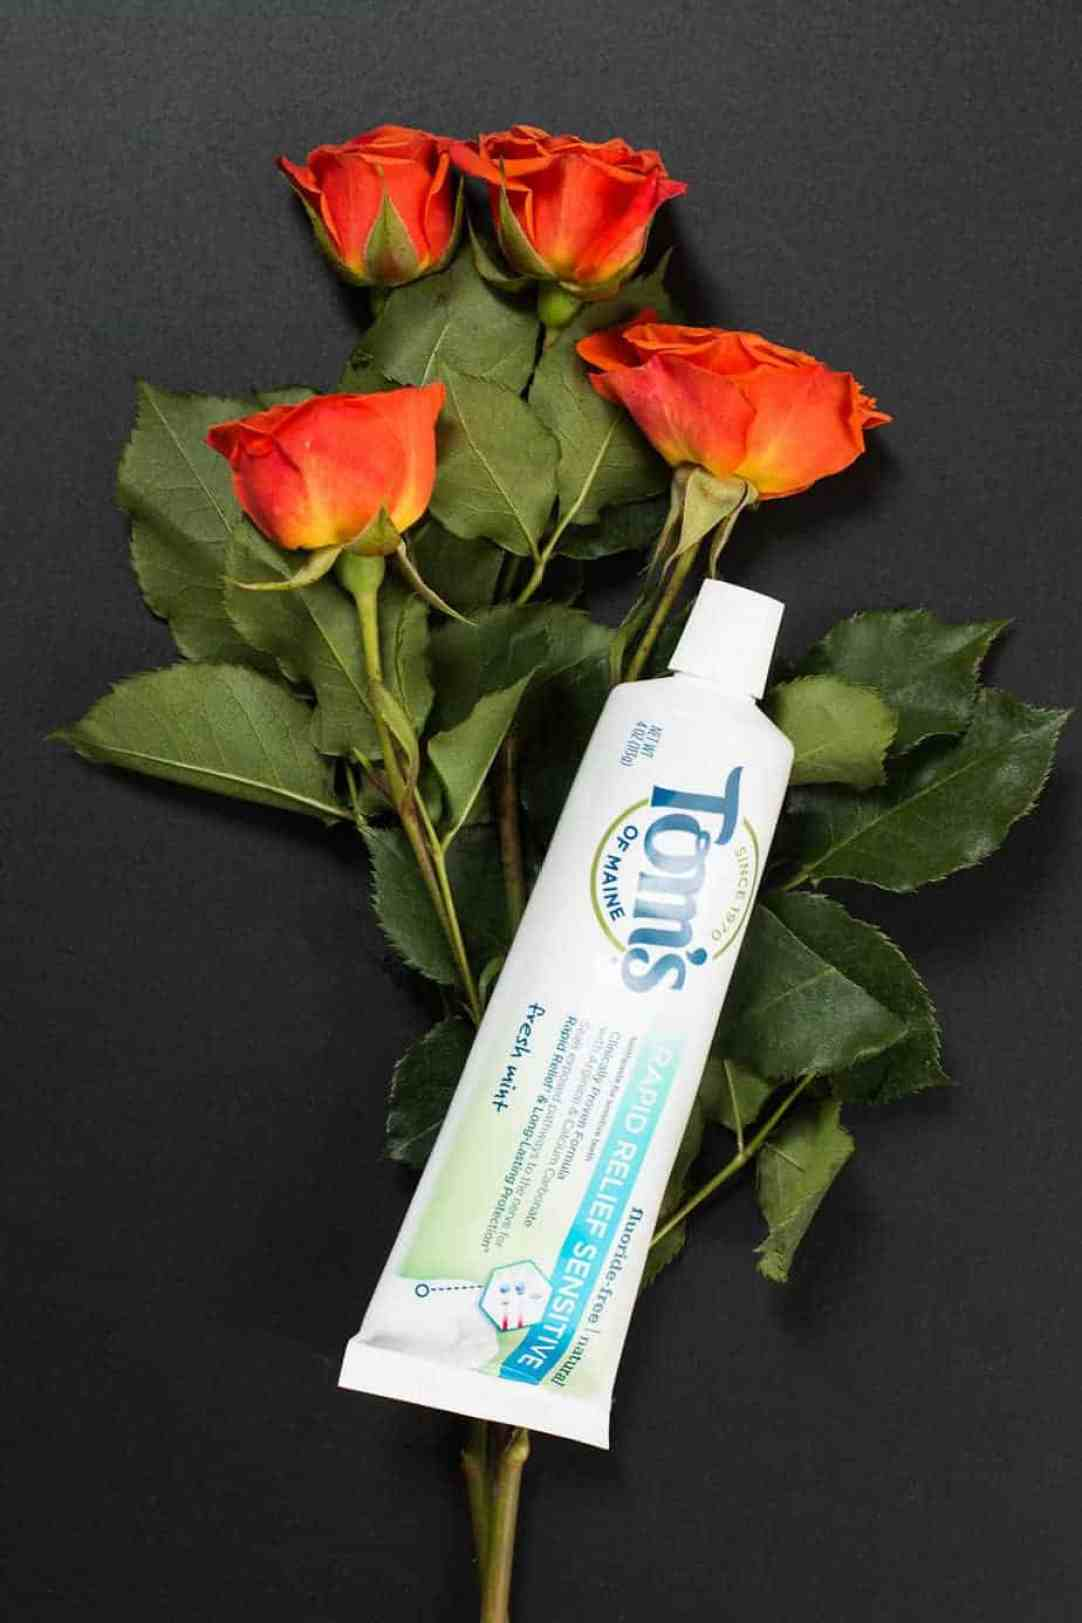 Tom's Maine Rapid Relief Sensitive Toothpaste